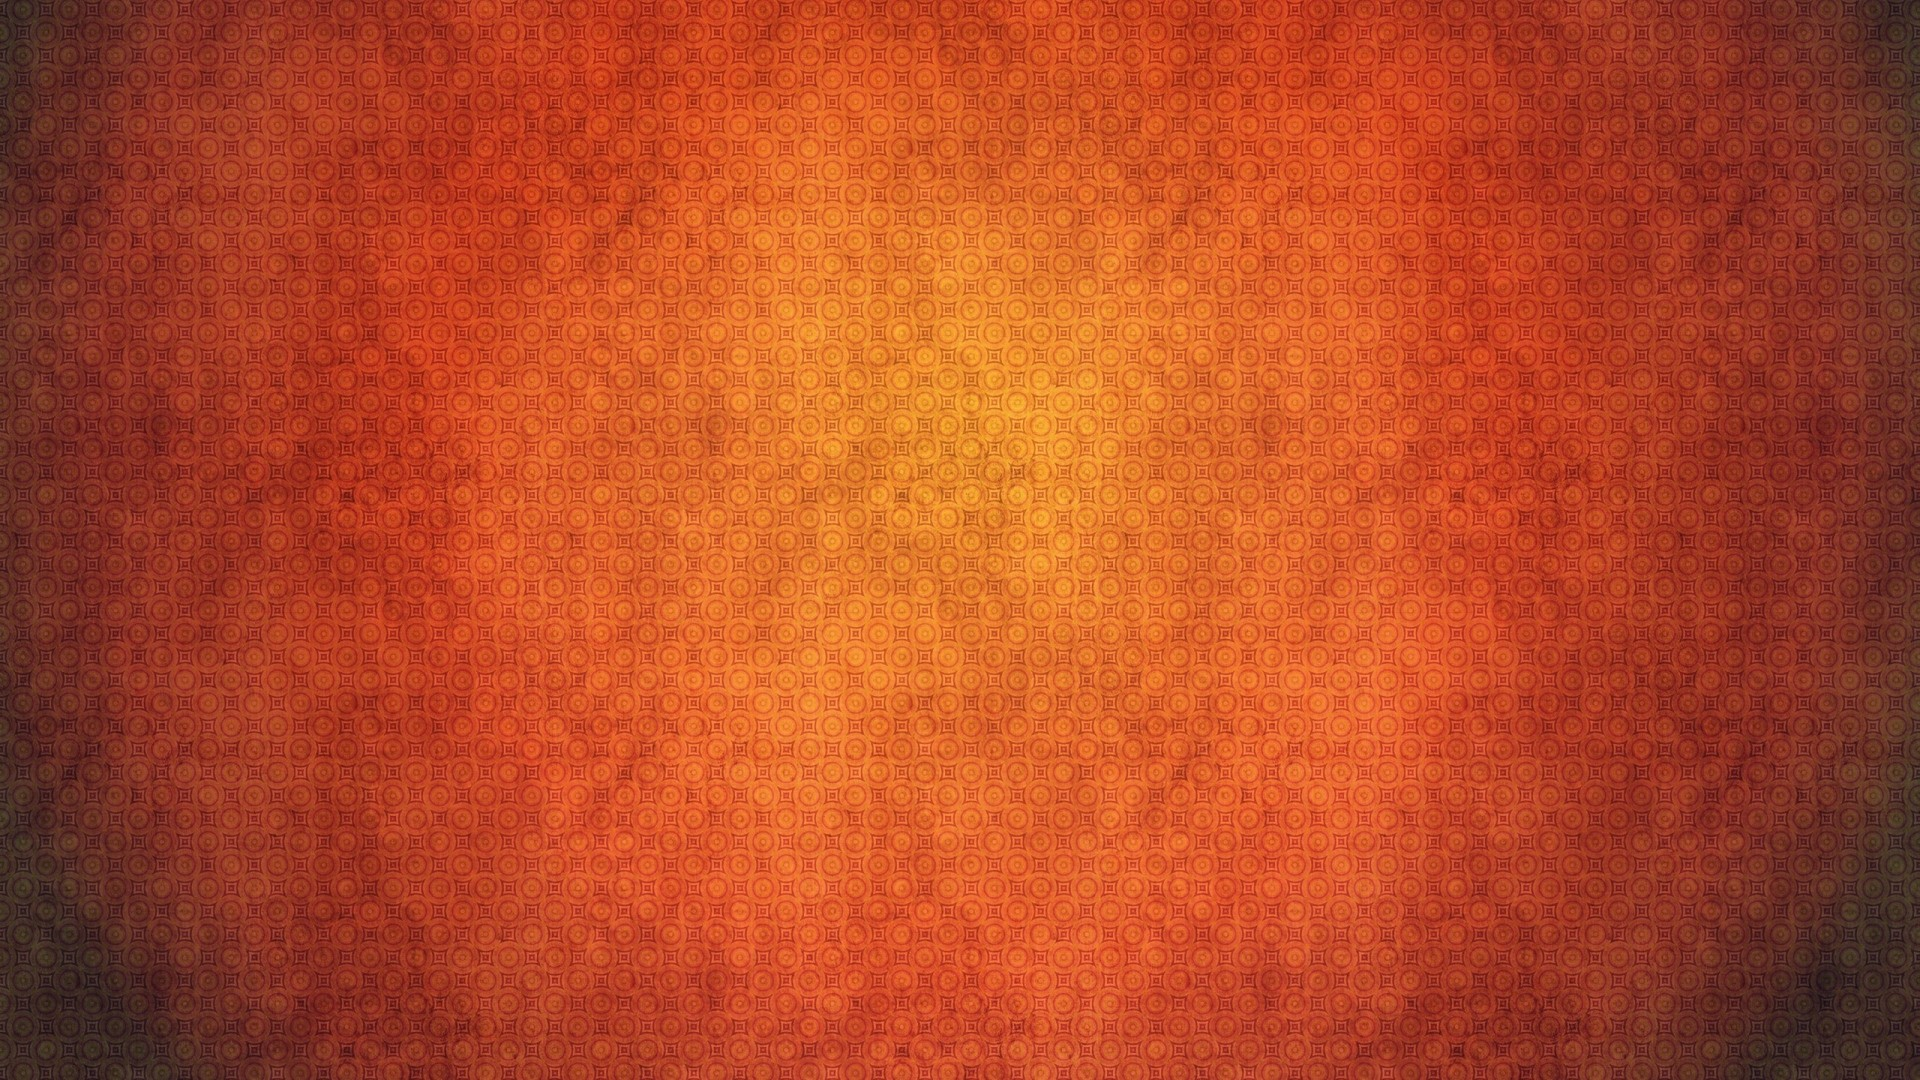 Wallpaper texture, orange, shadow